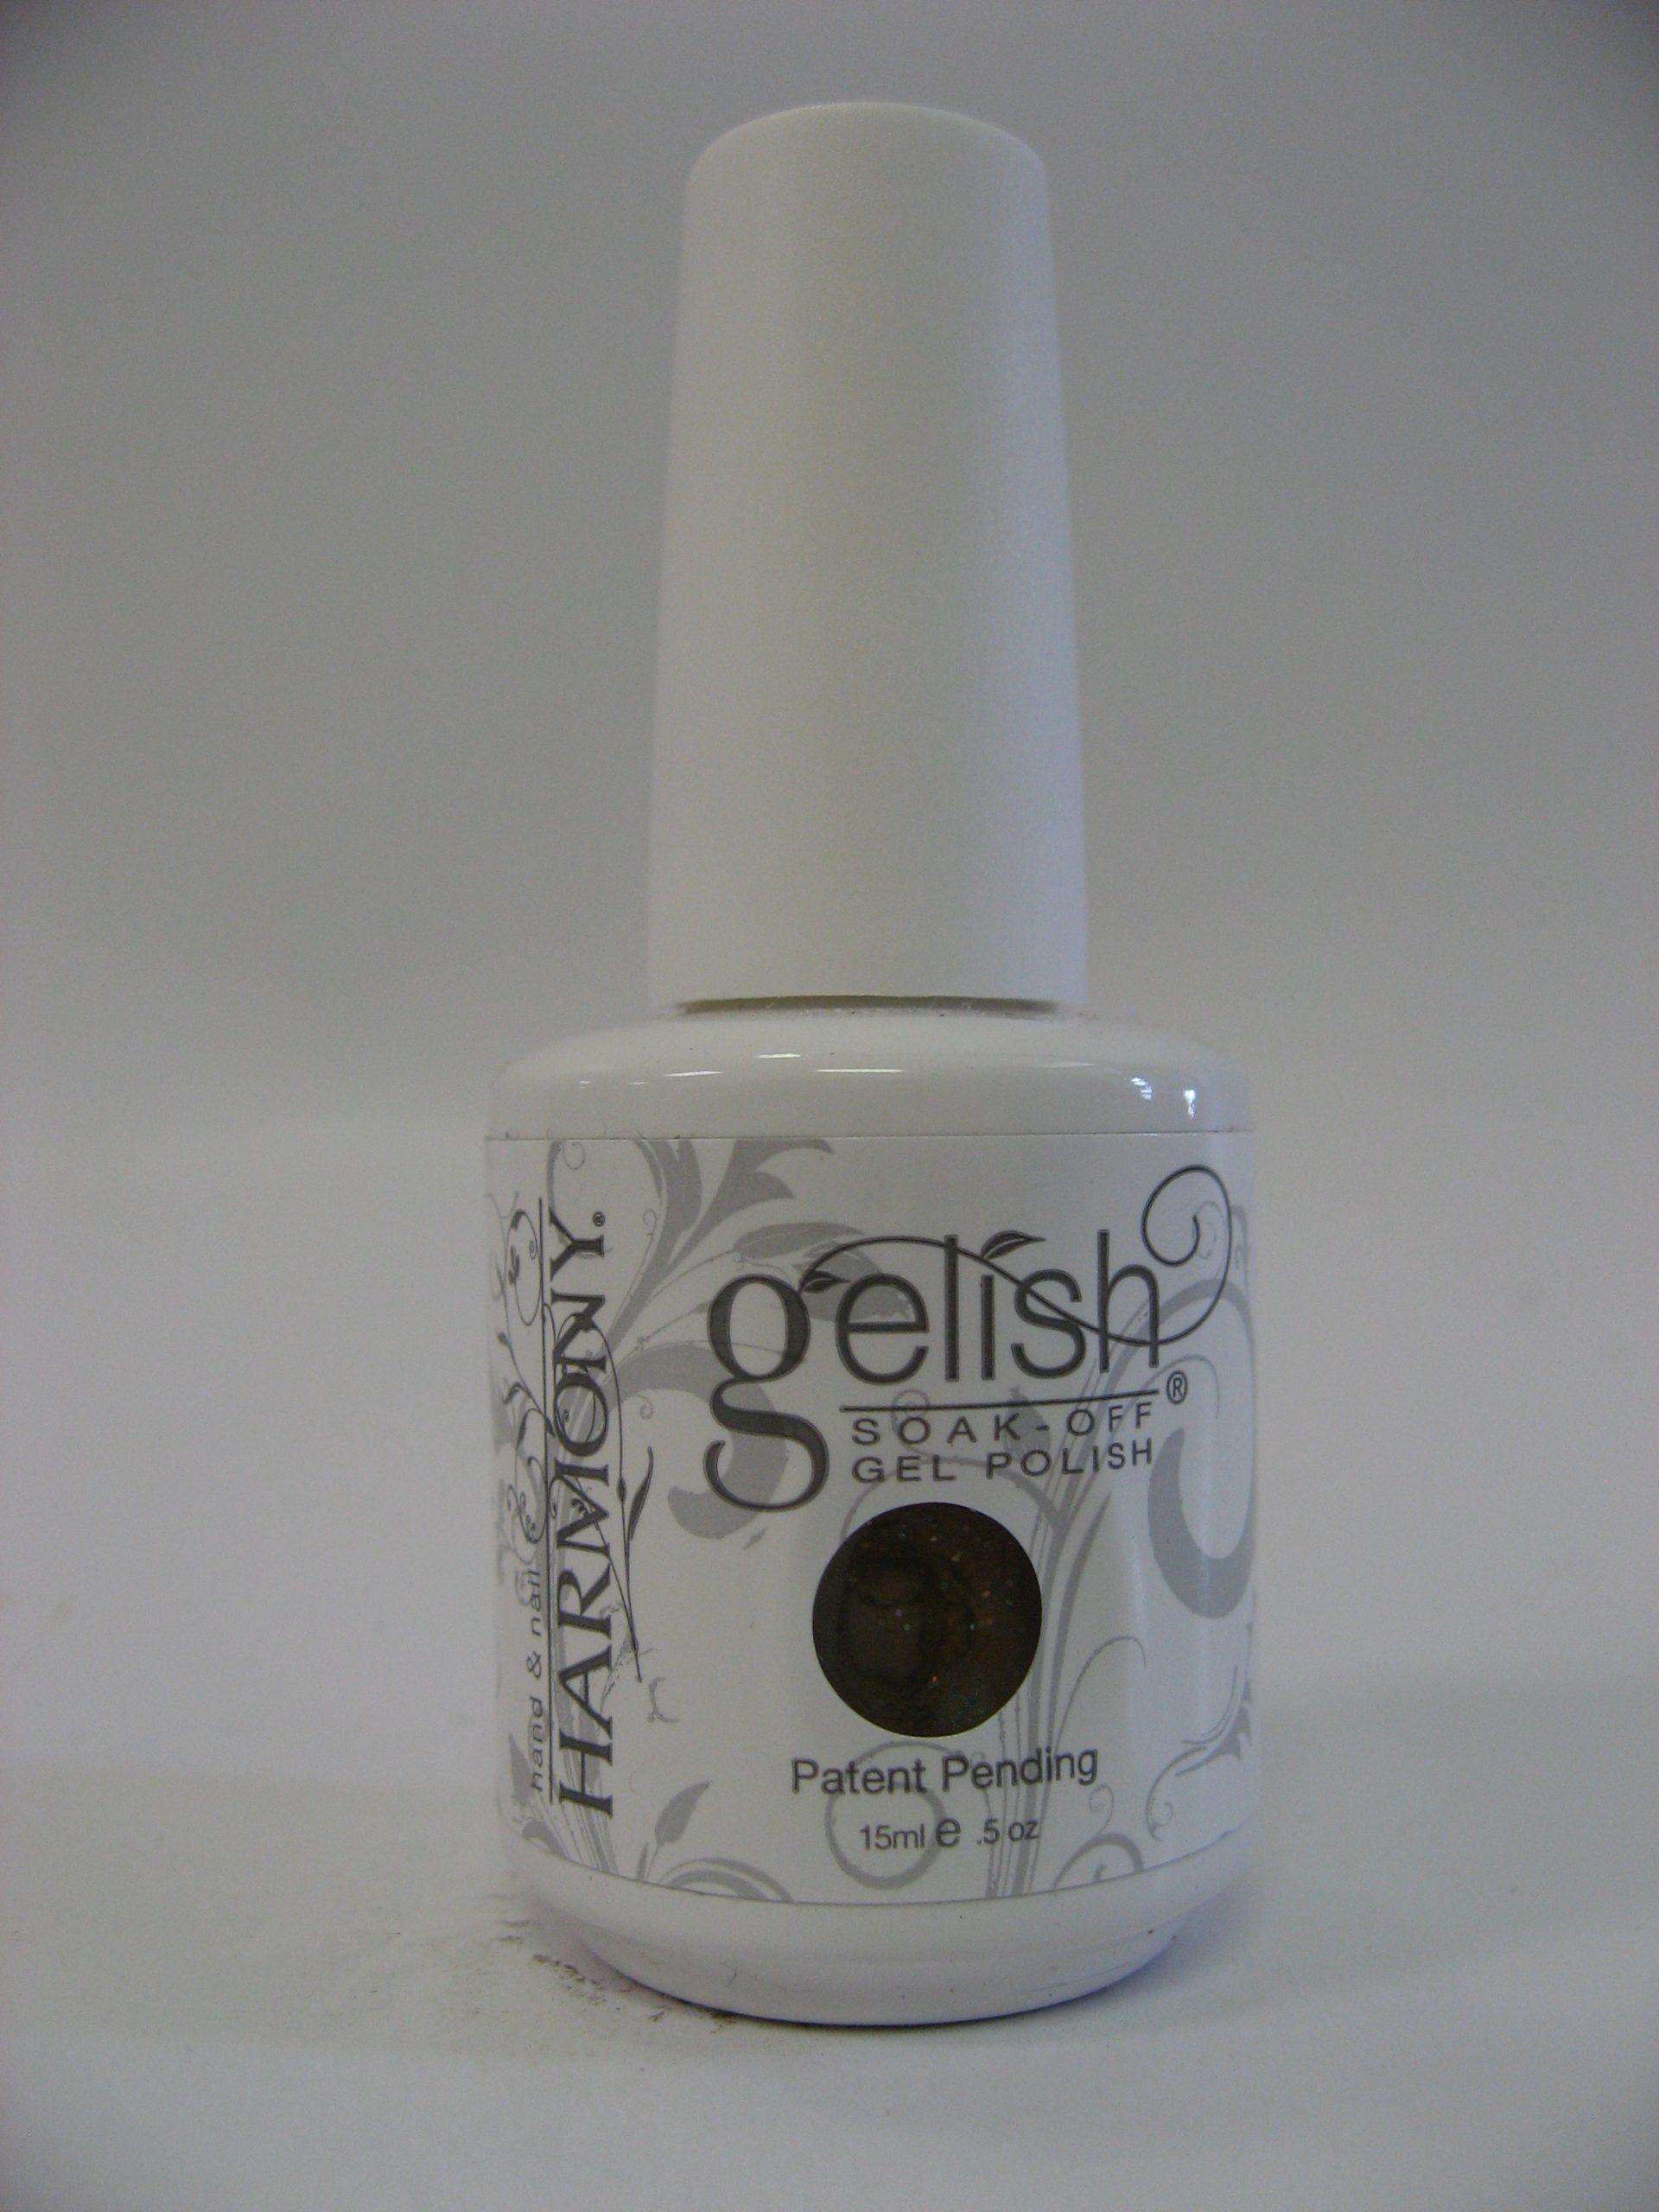 Gelish Soak Off Gel Polish - 1403 - Tickle My Heart